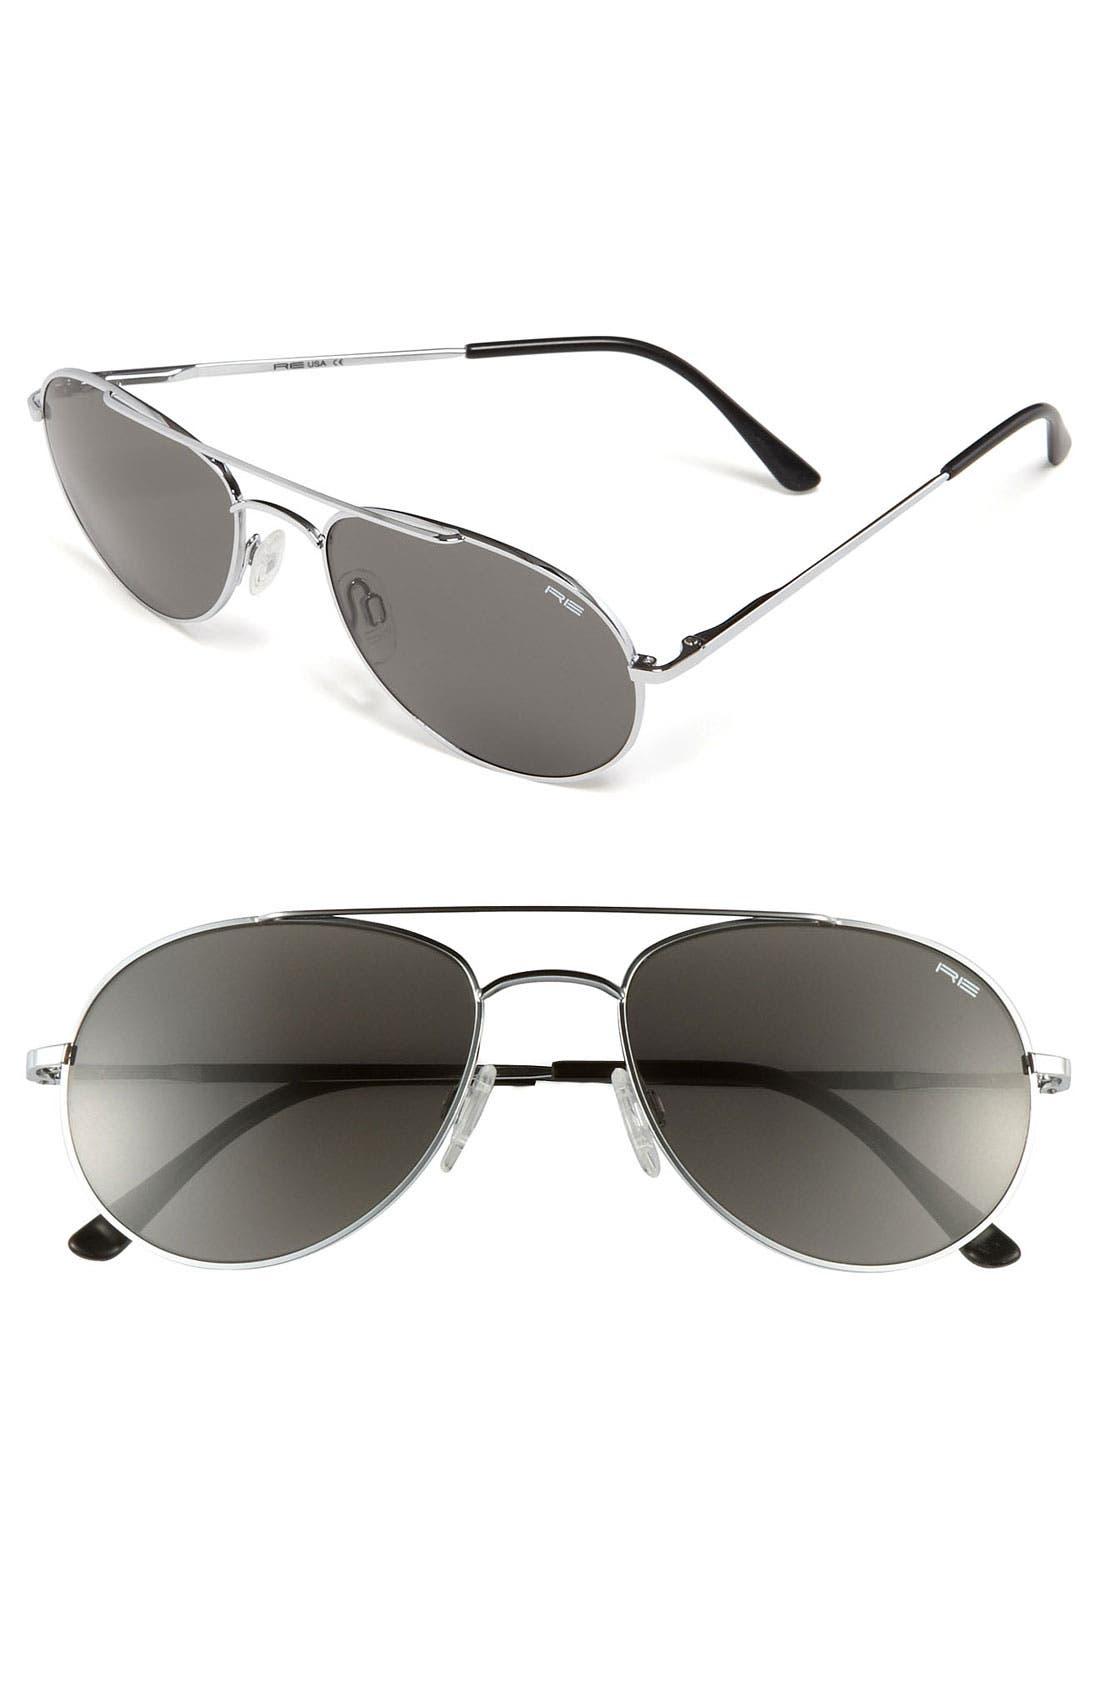 Main Image - Randolph Engineering 'Crew Chief' 54mm Sunglasses